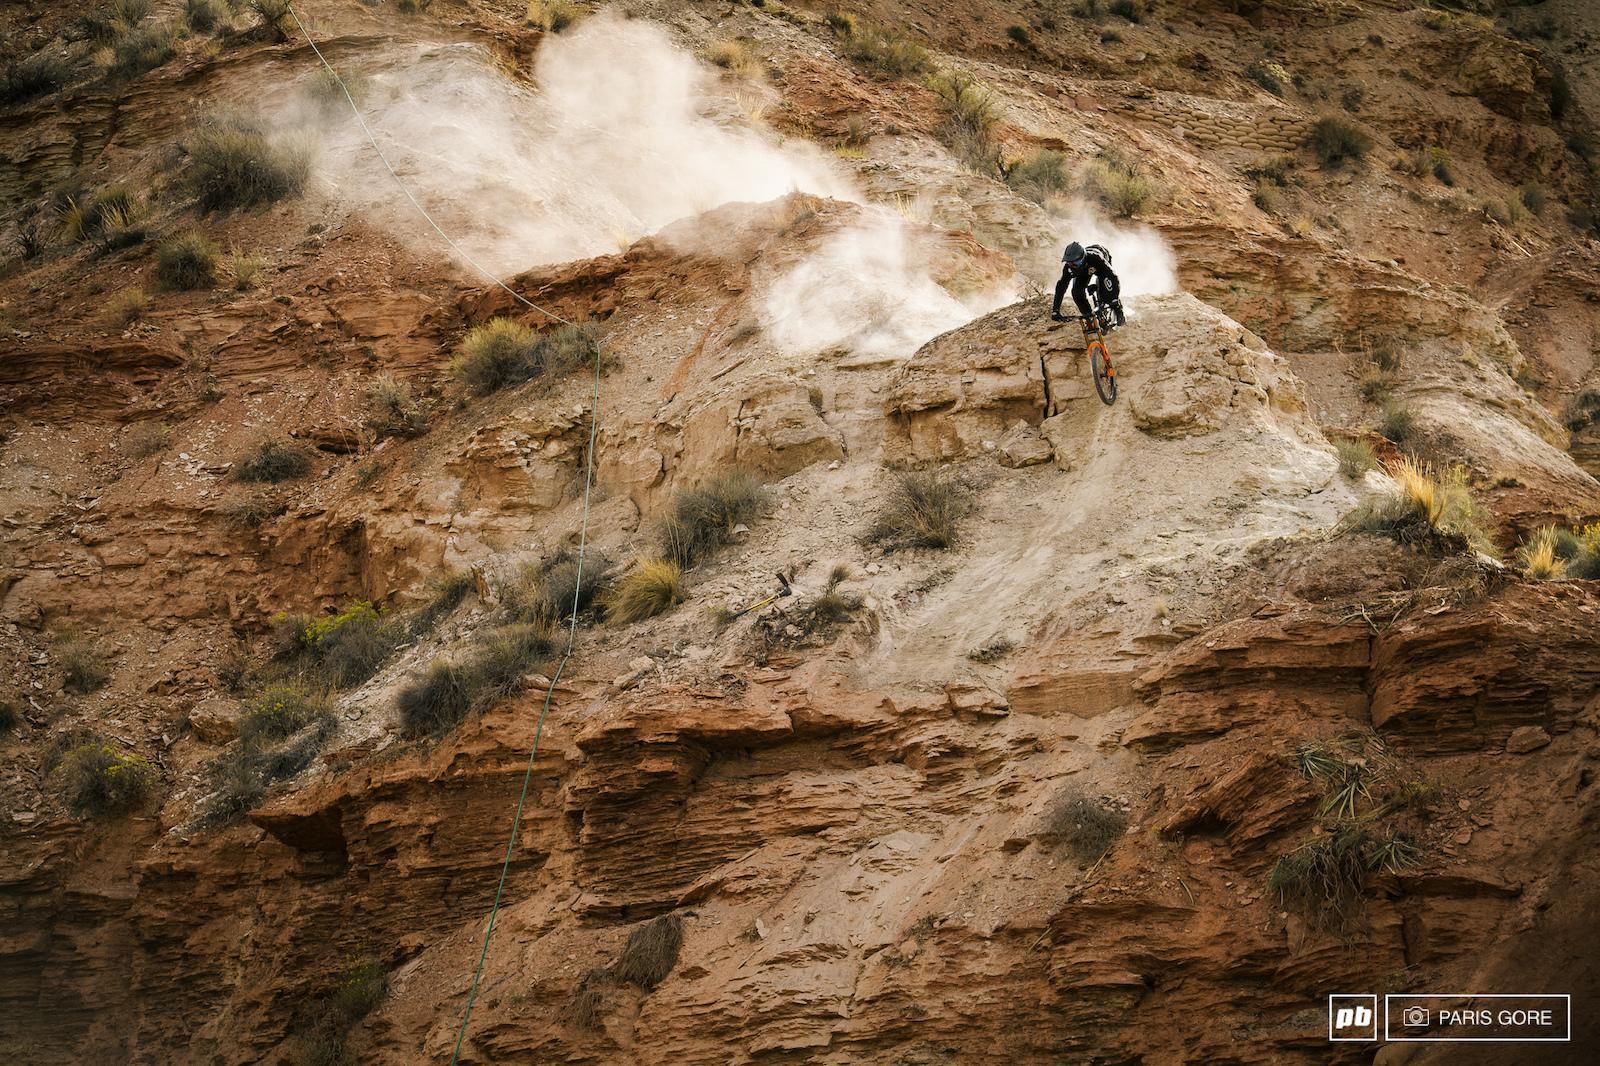 Tom Van Steenbergen testing out a drop mid mountain.